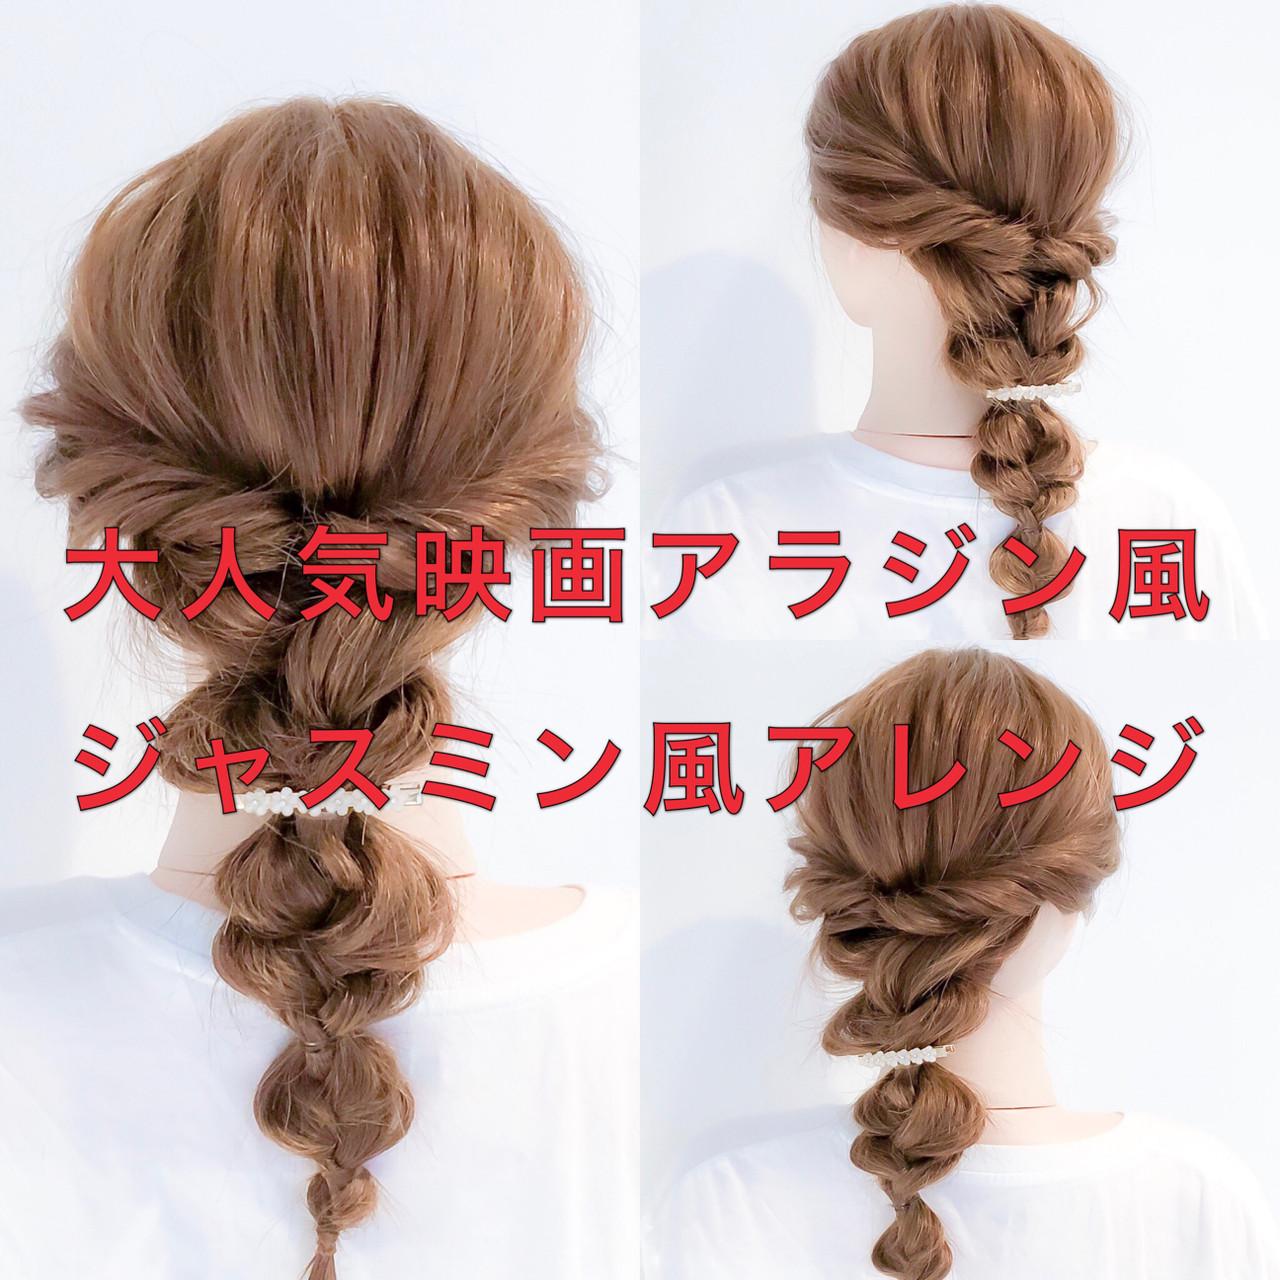 美容師HIRO/Amoute代表